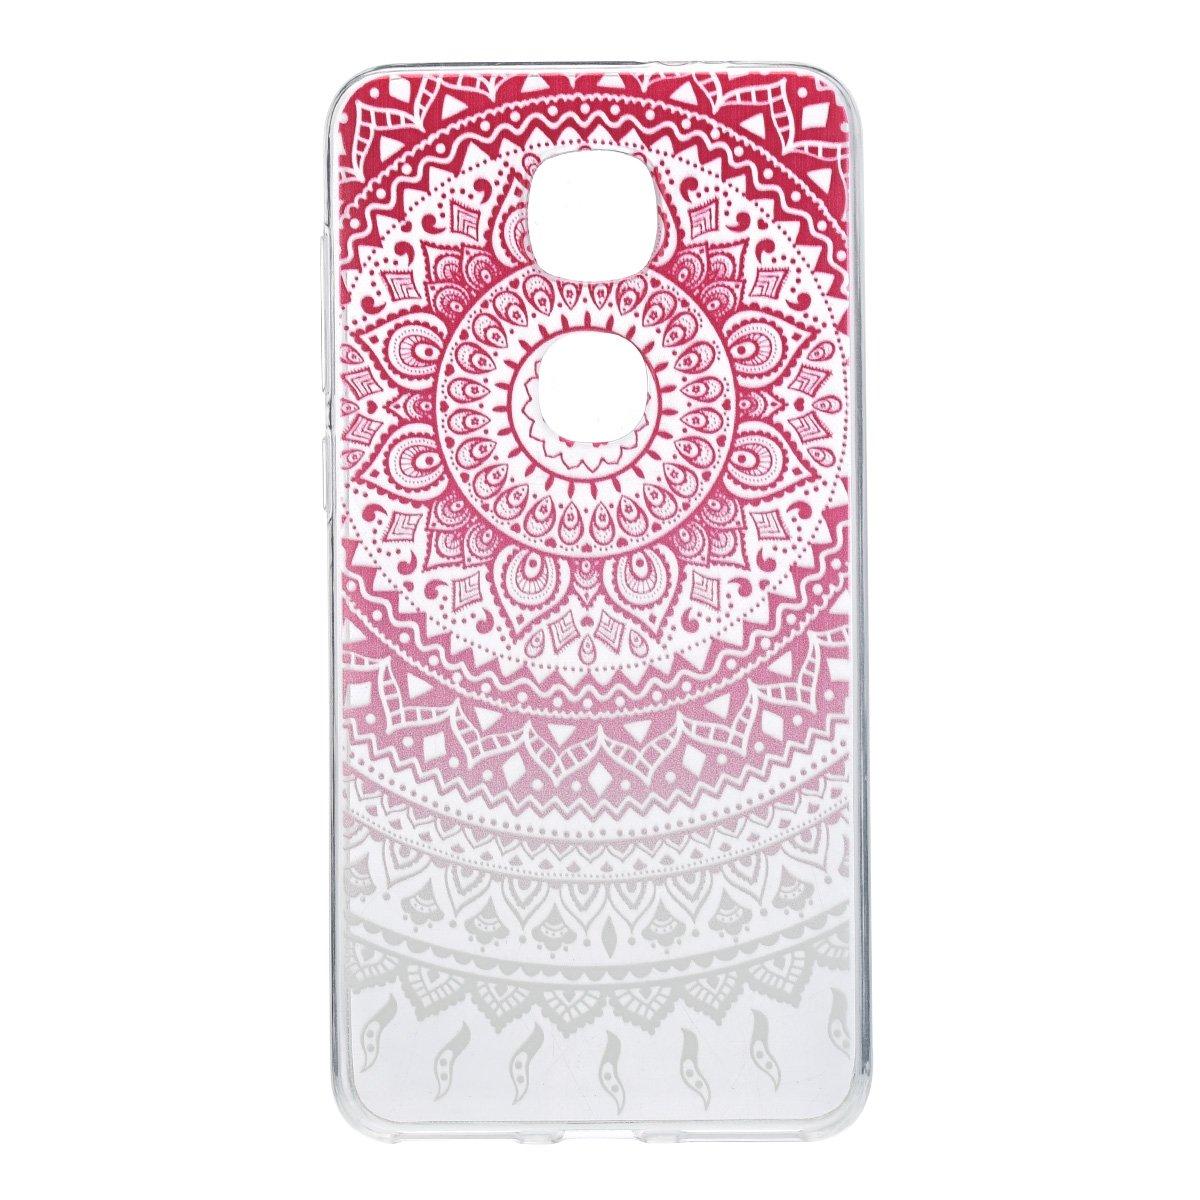 könig-shop Funda de móvil schutz-cover Carcasa Estuche - India Sol Rosa Blanco Transparente, Samsung...